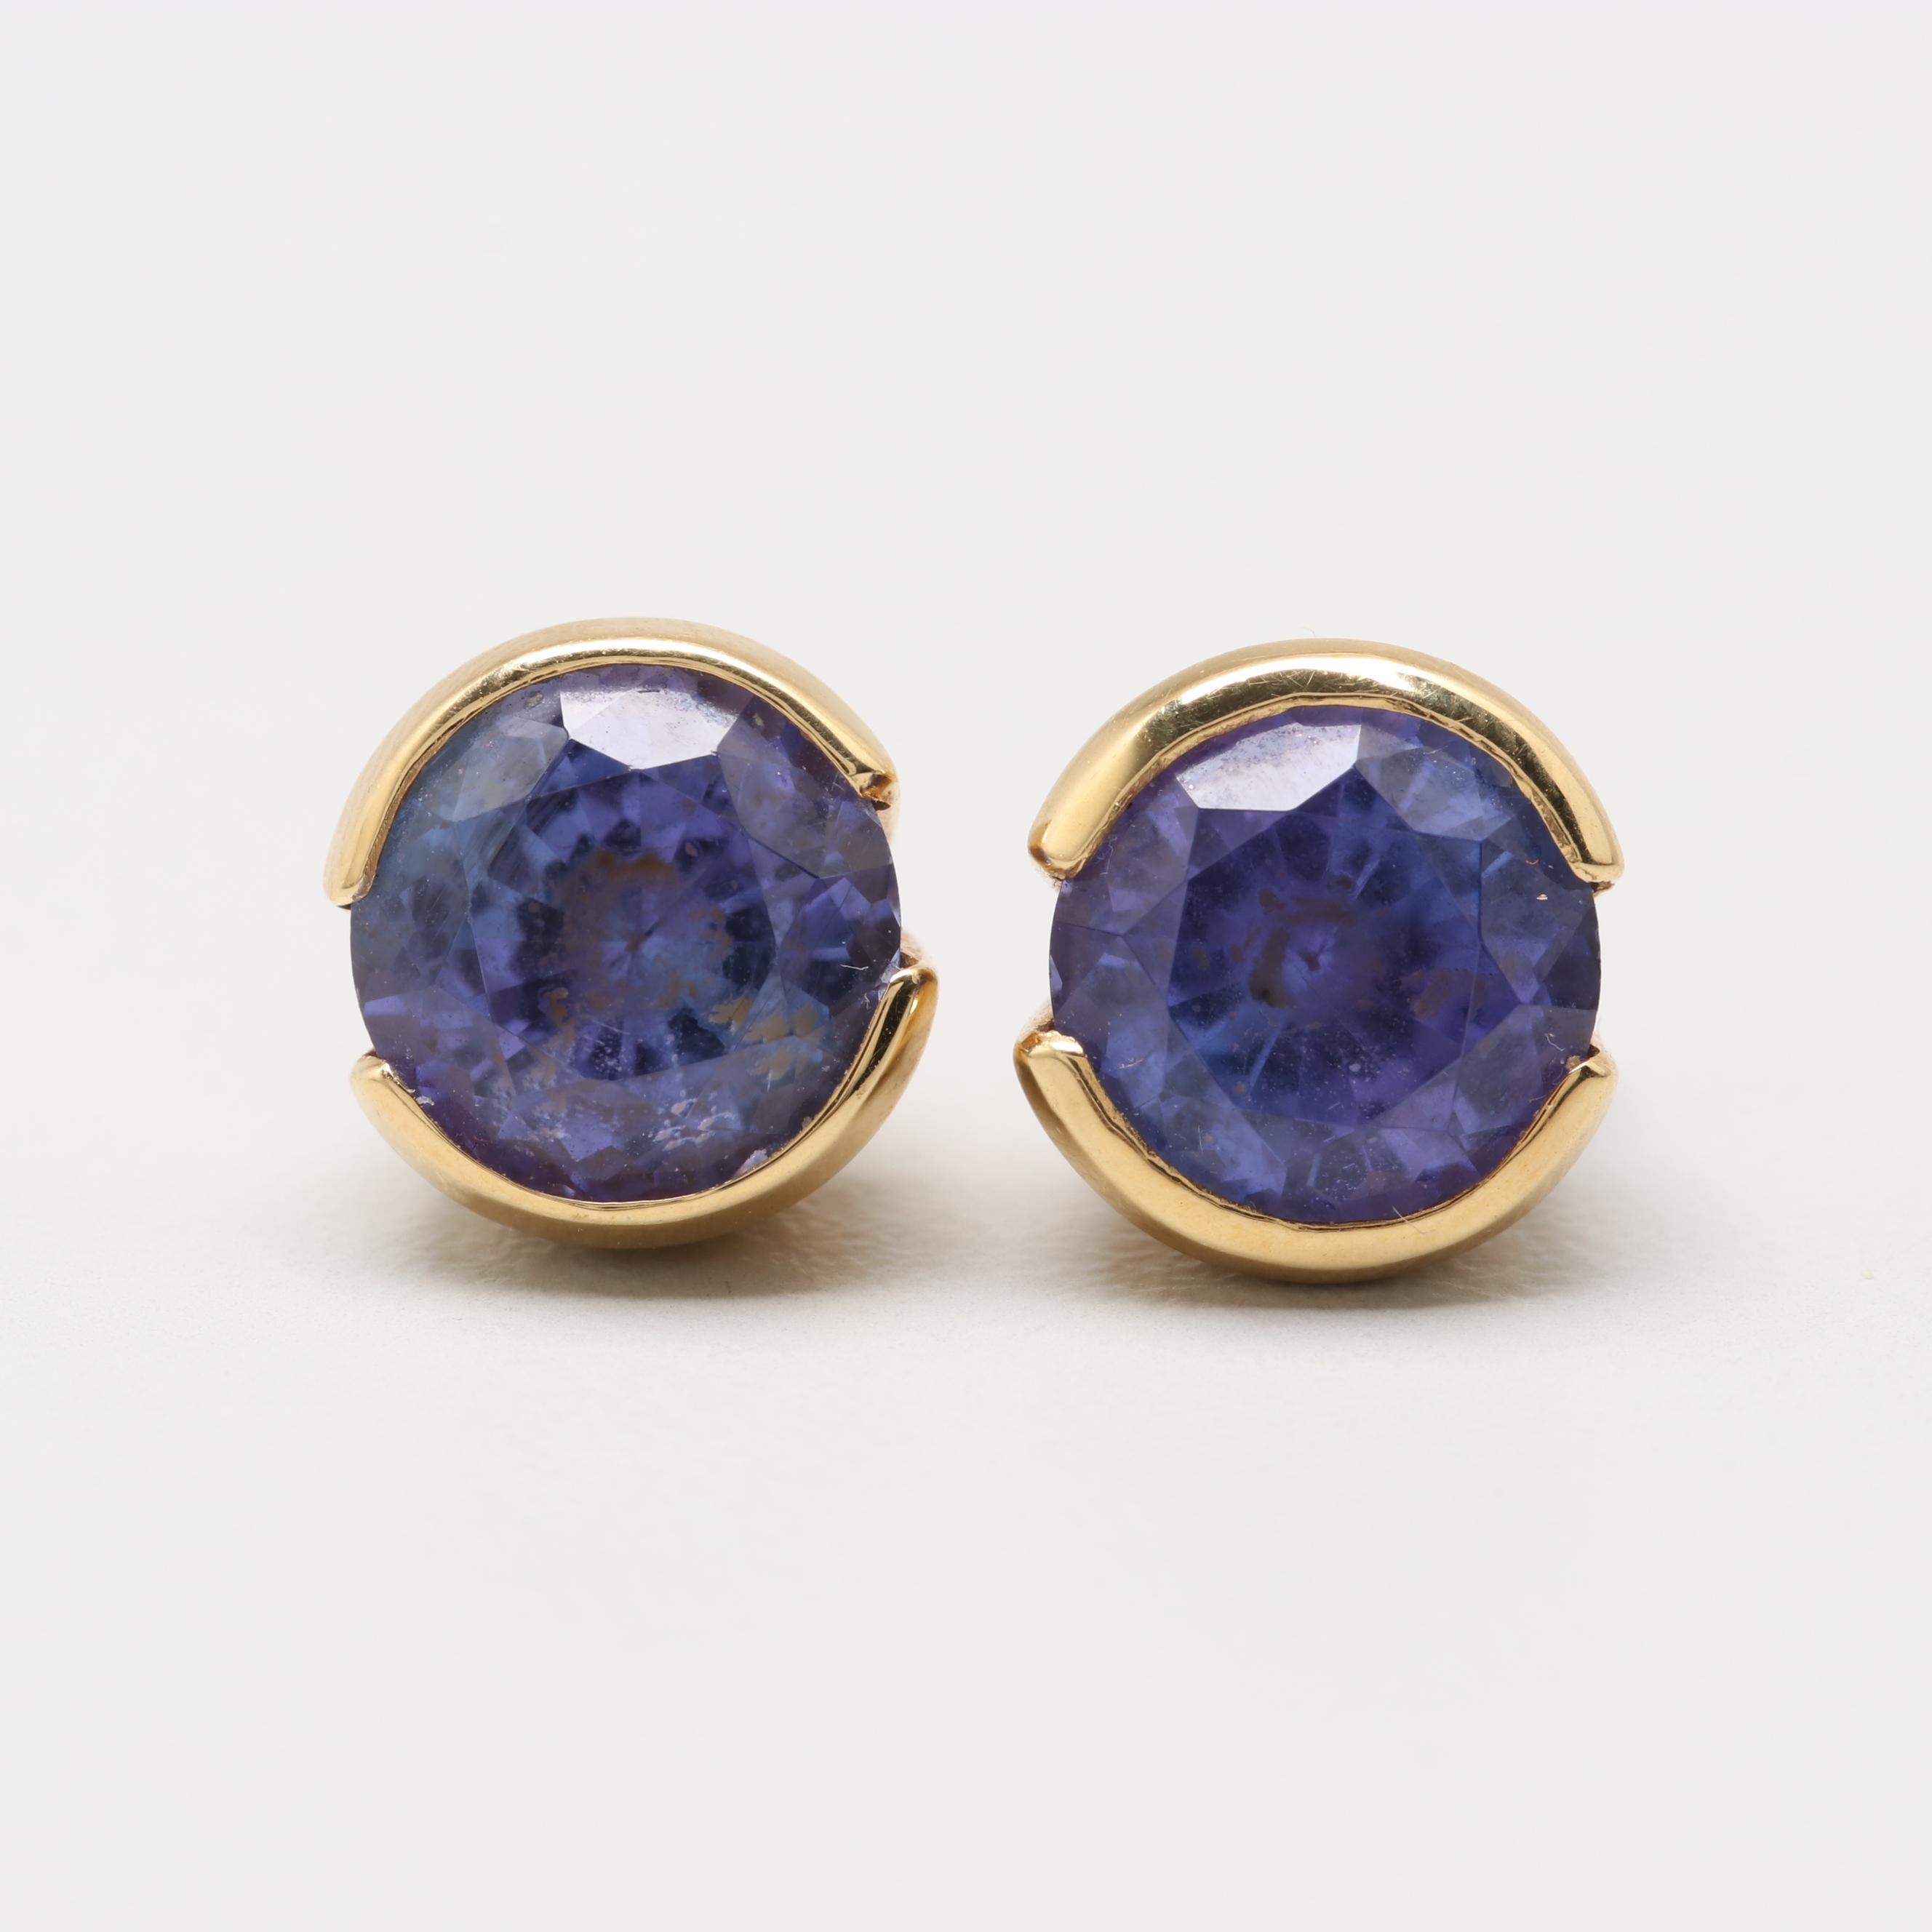 18K Yellow Gold Tanzanite Stud Style Earrings